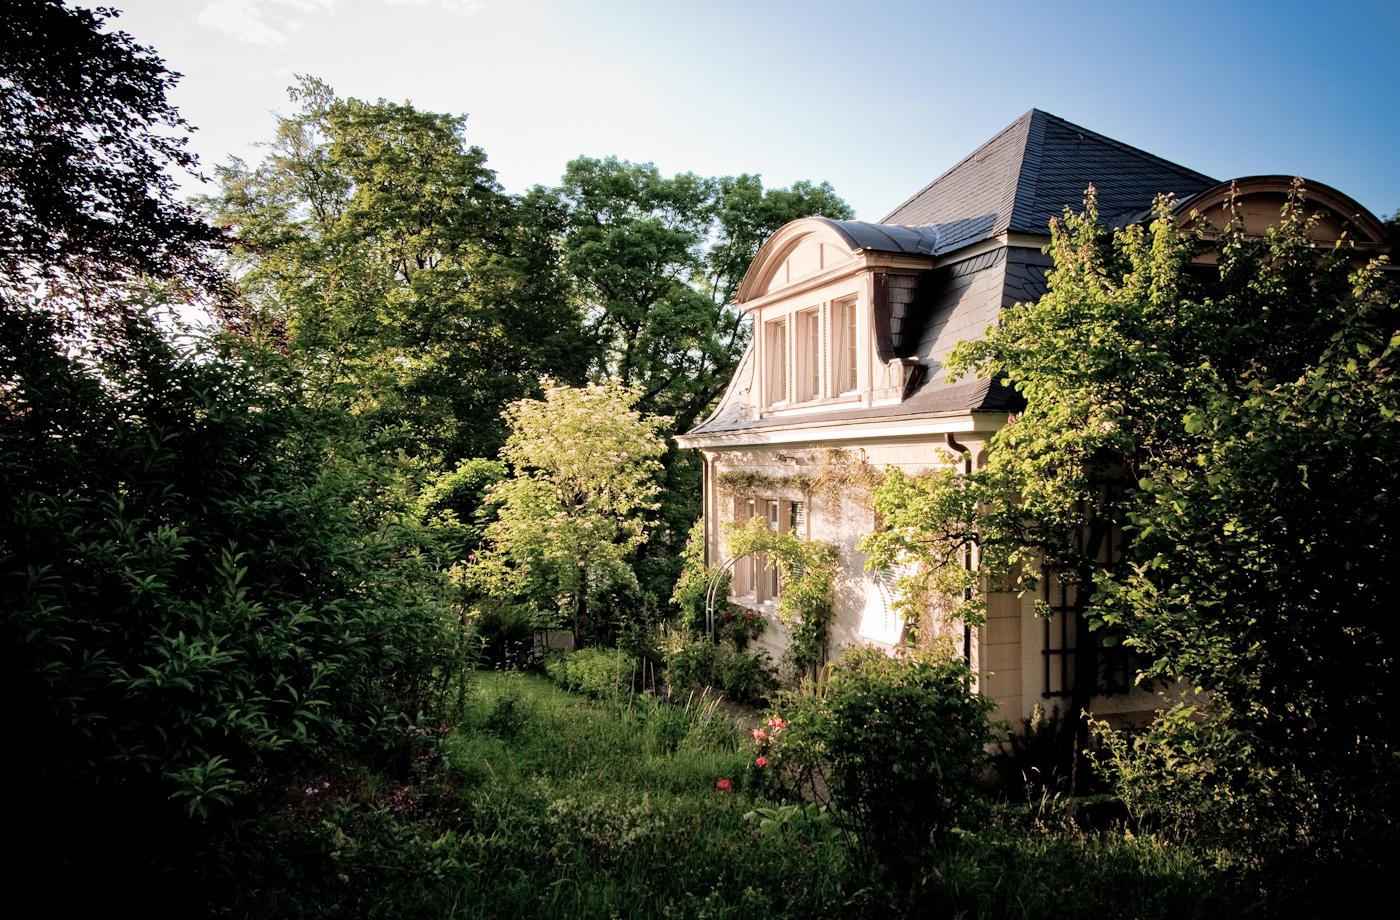 Reverend's Garden